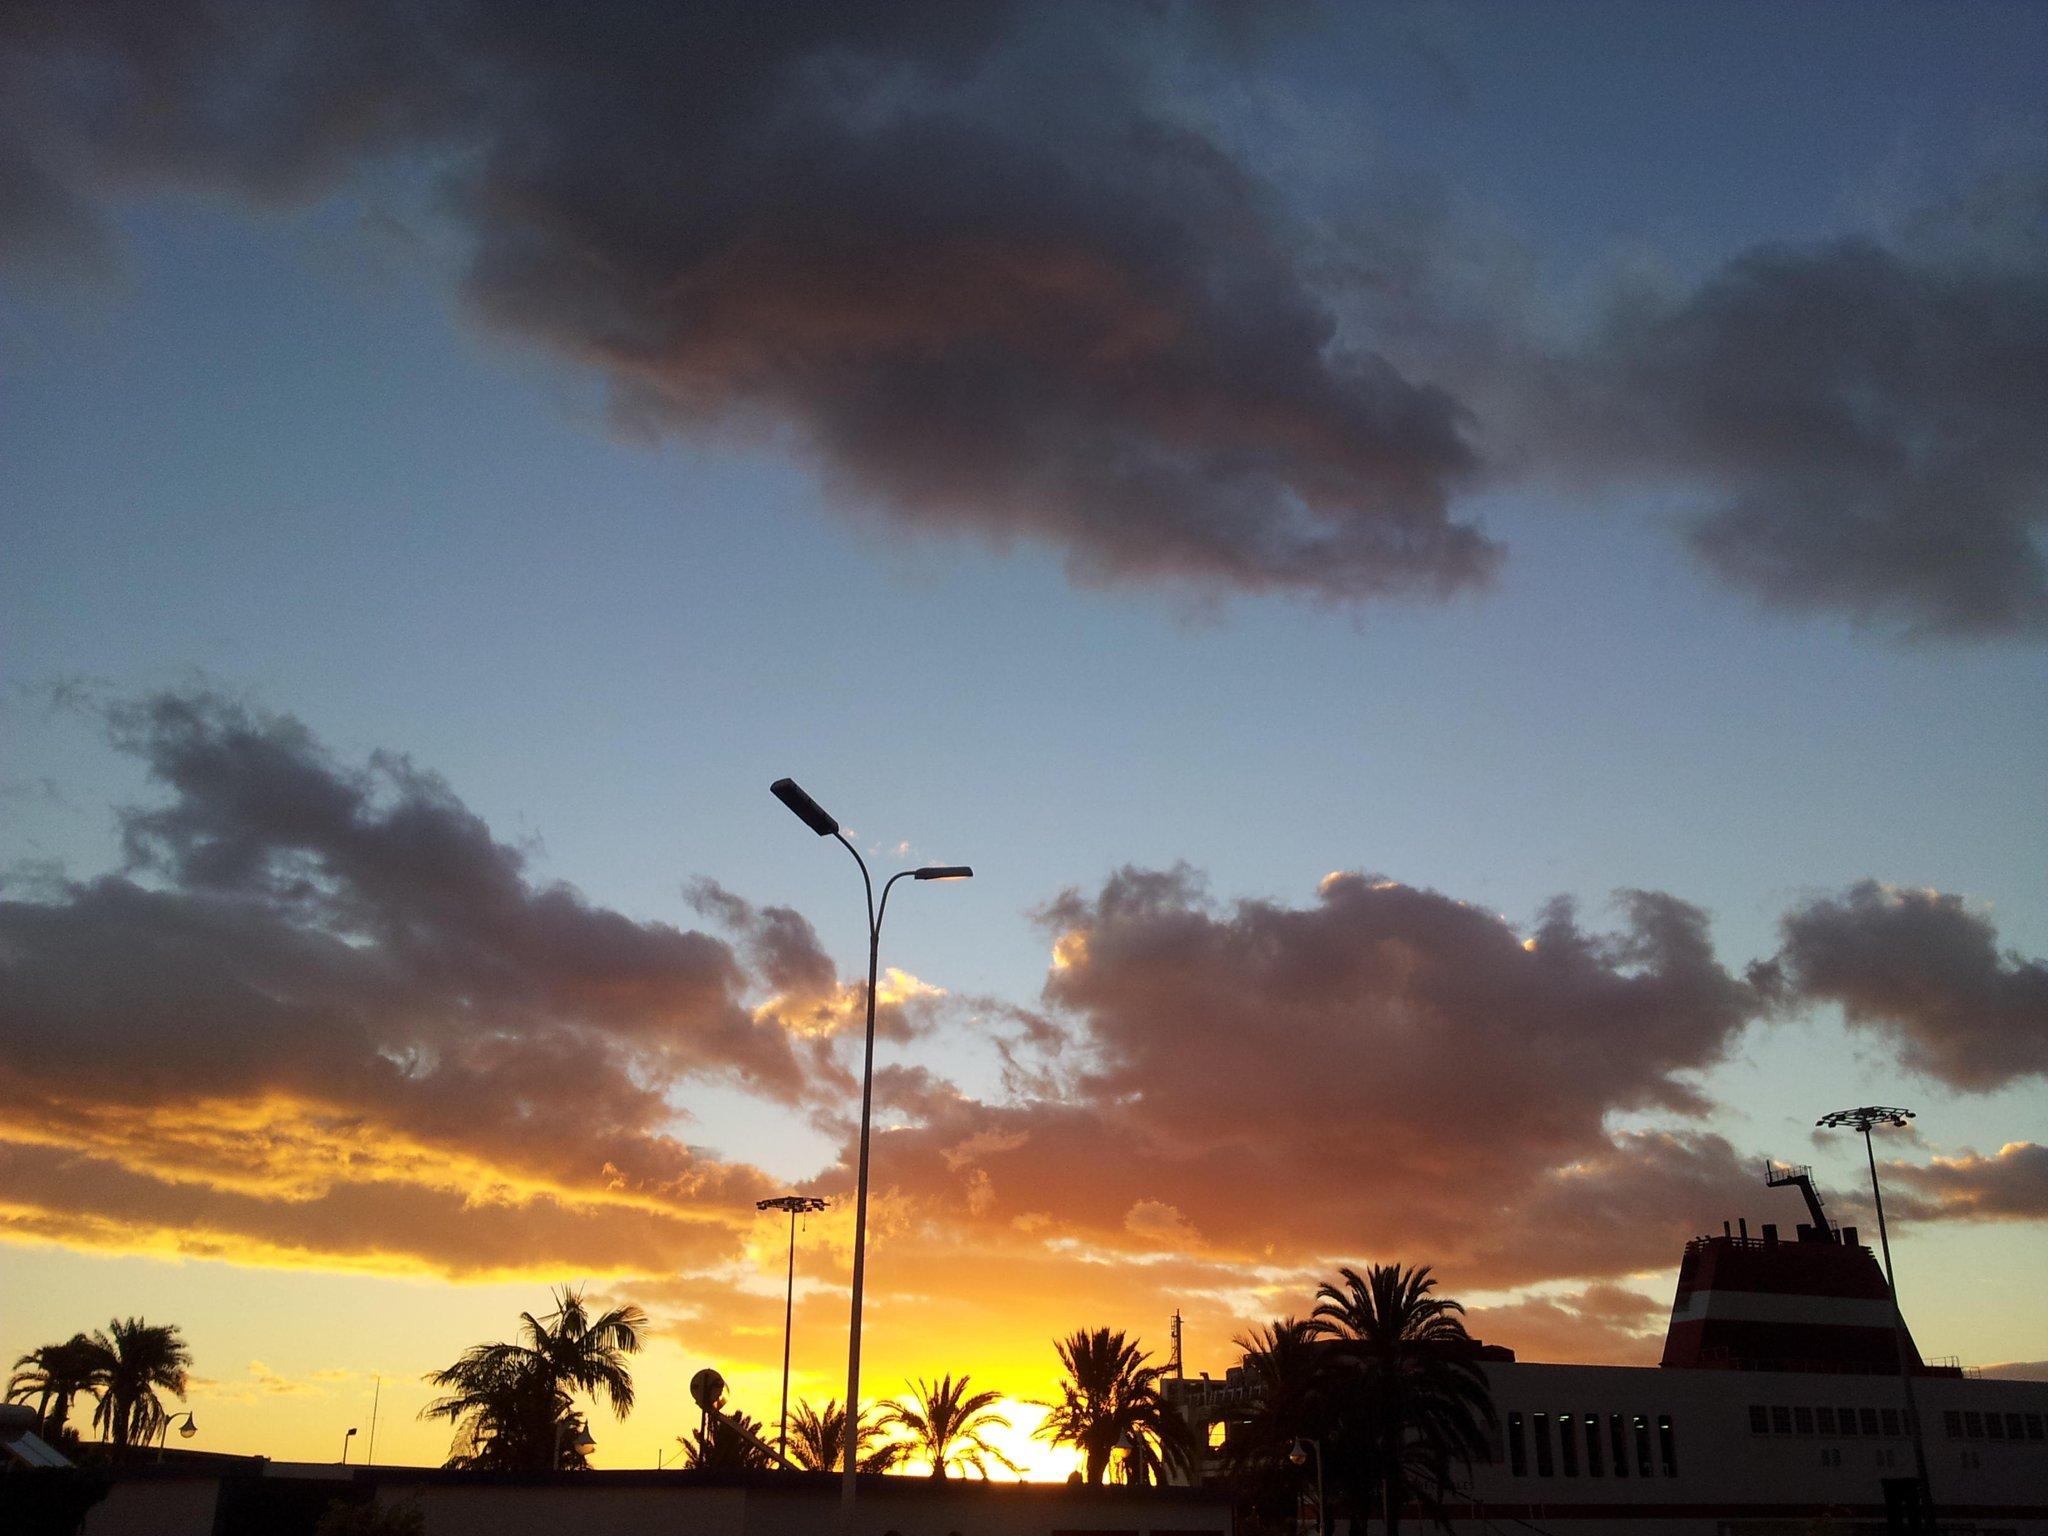 Amanecer en La Palma, de @artesanolapalma